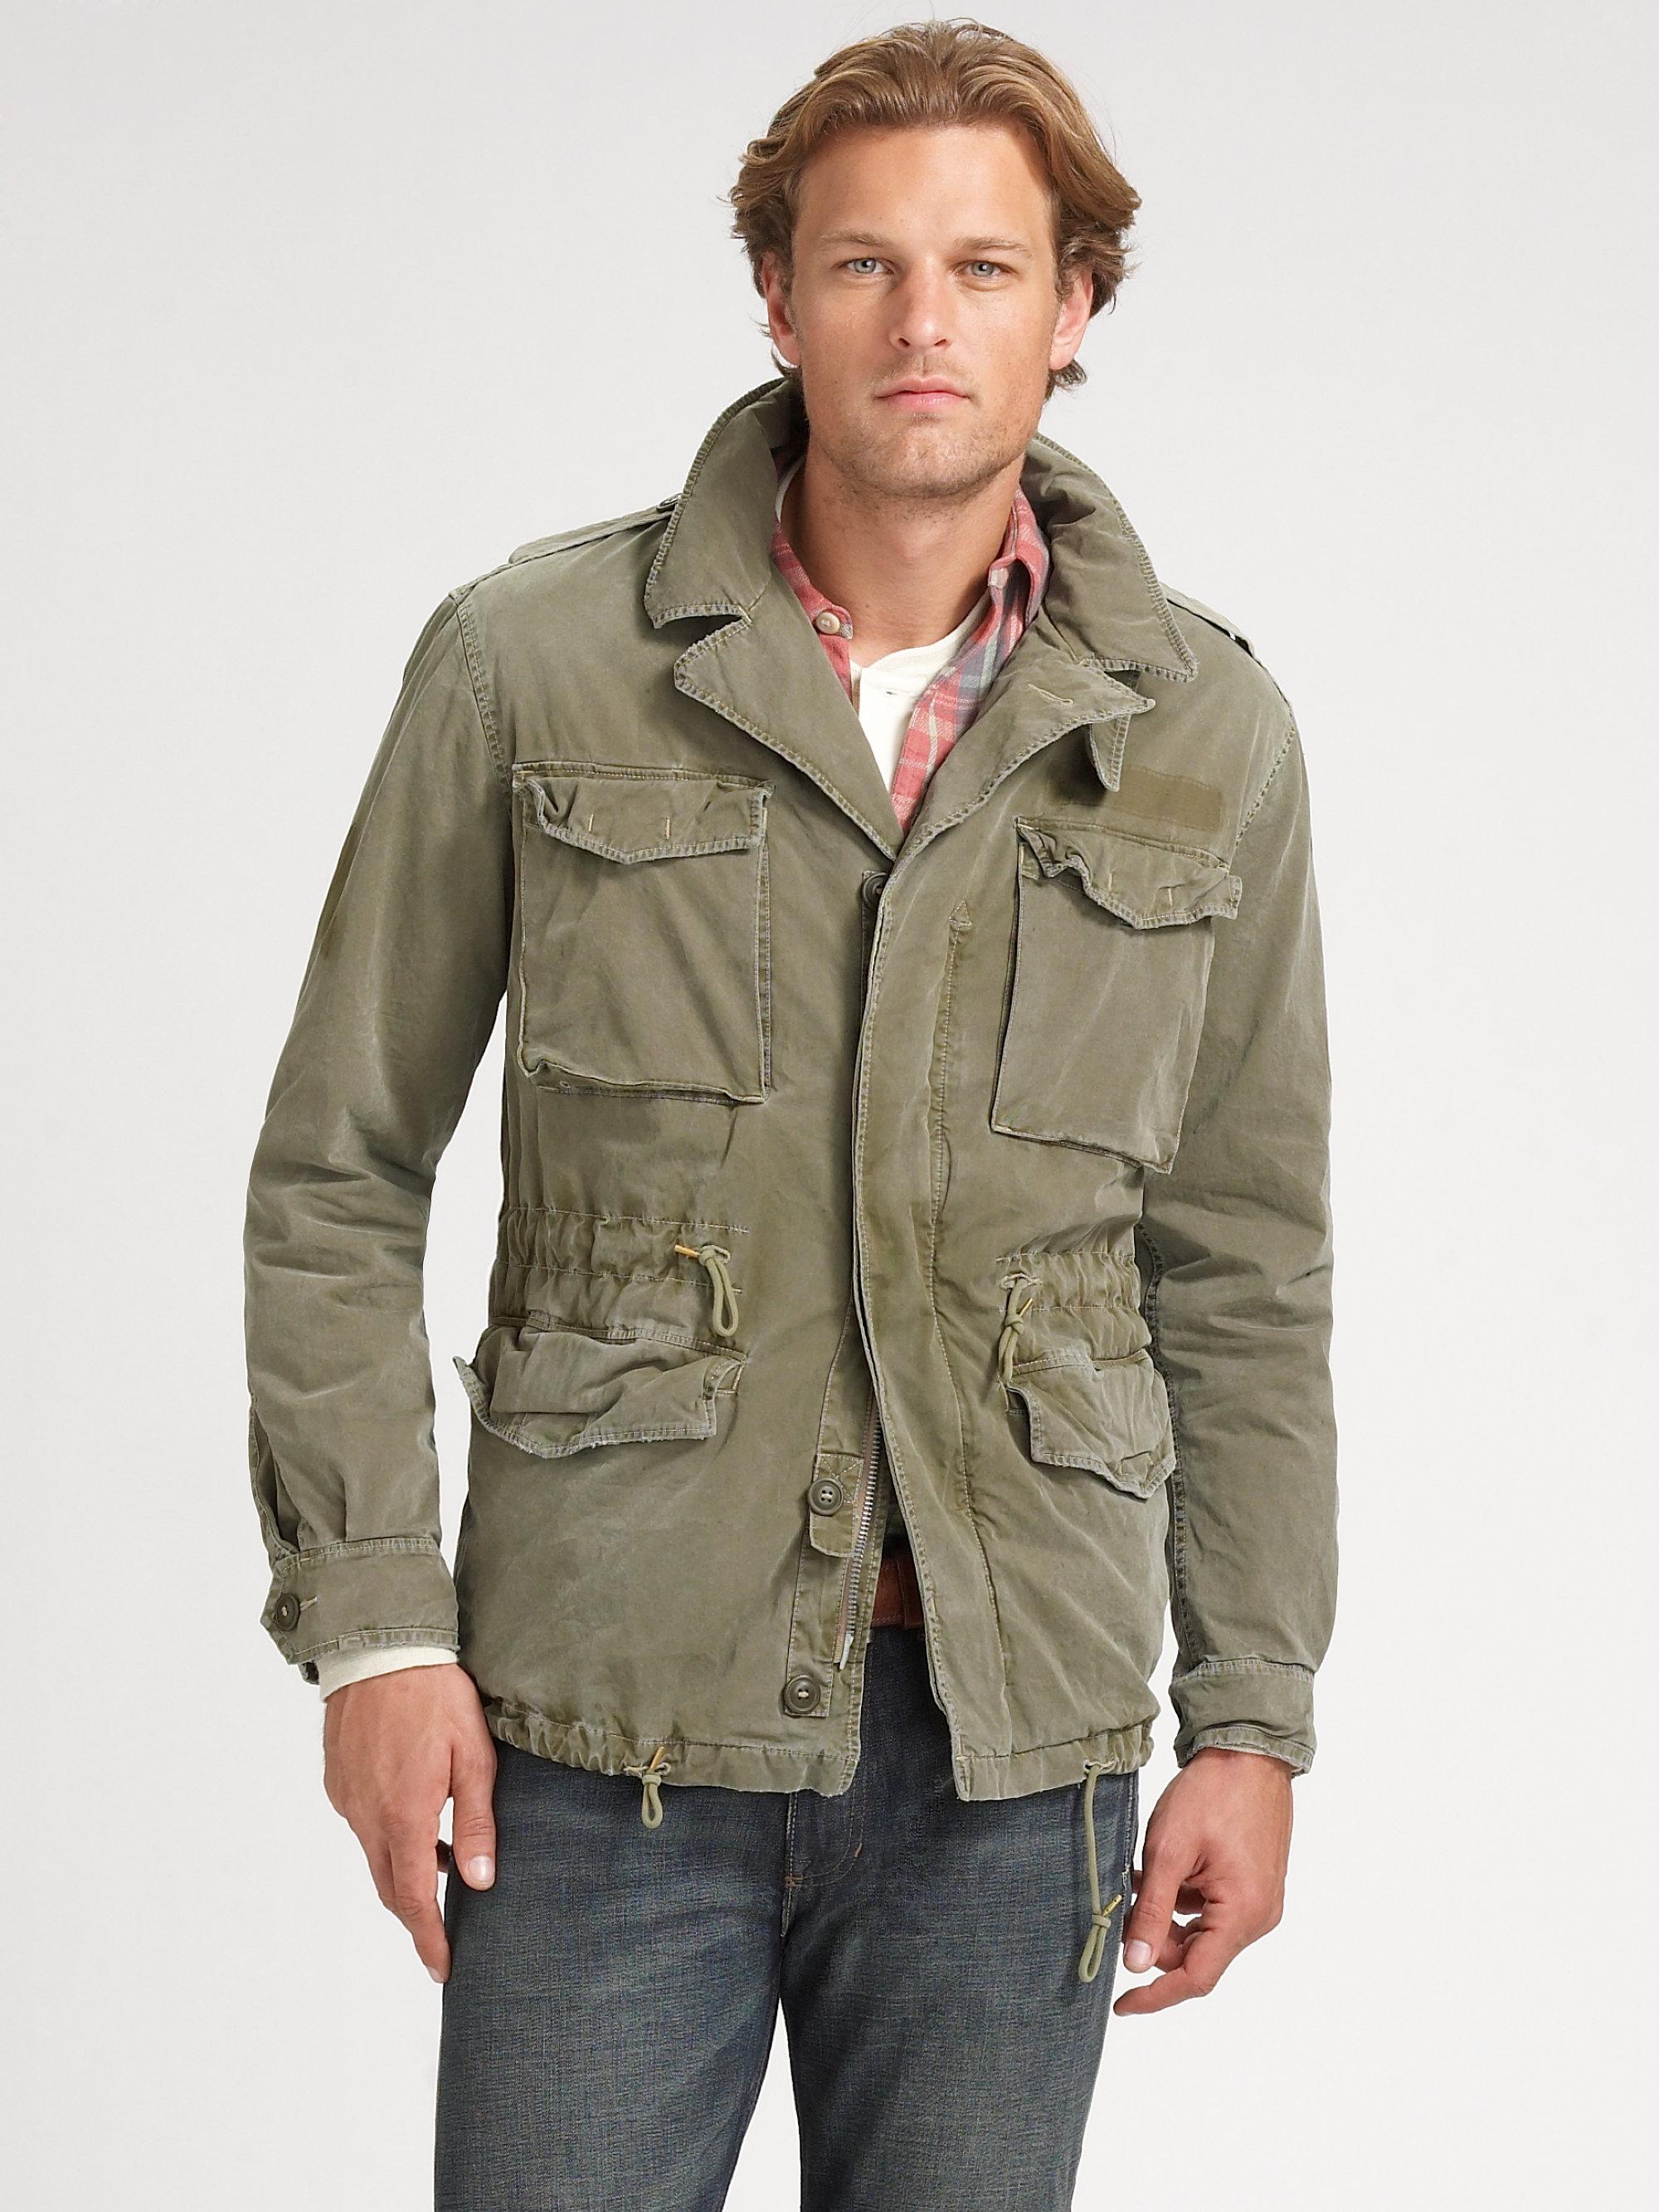 Ralph Lauren Fashion Show At New York: Polo Ralph Lauren Military Combat Jacket In Green